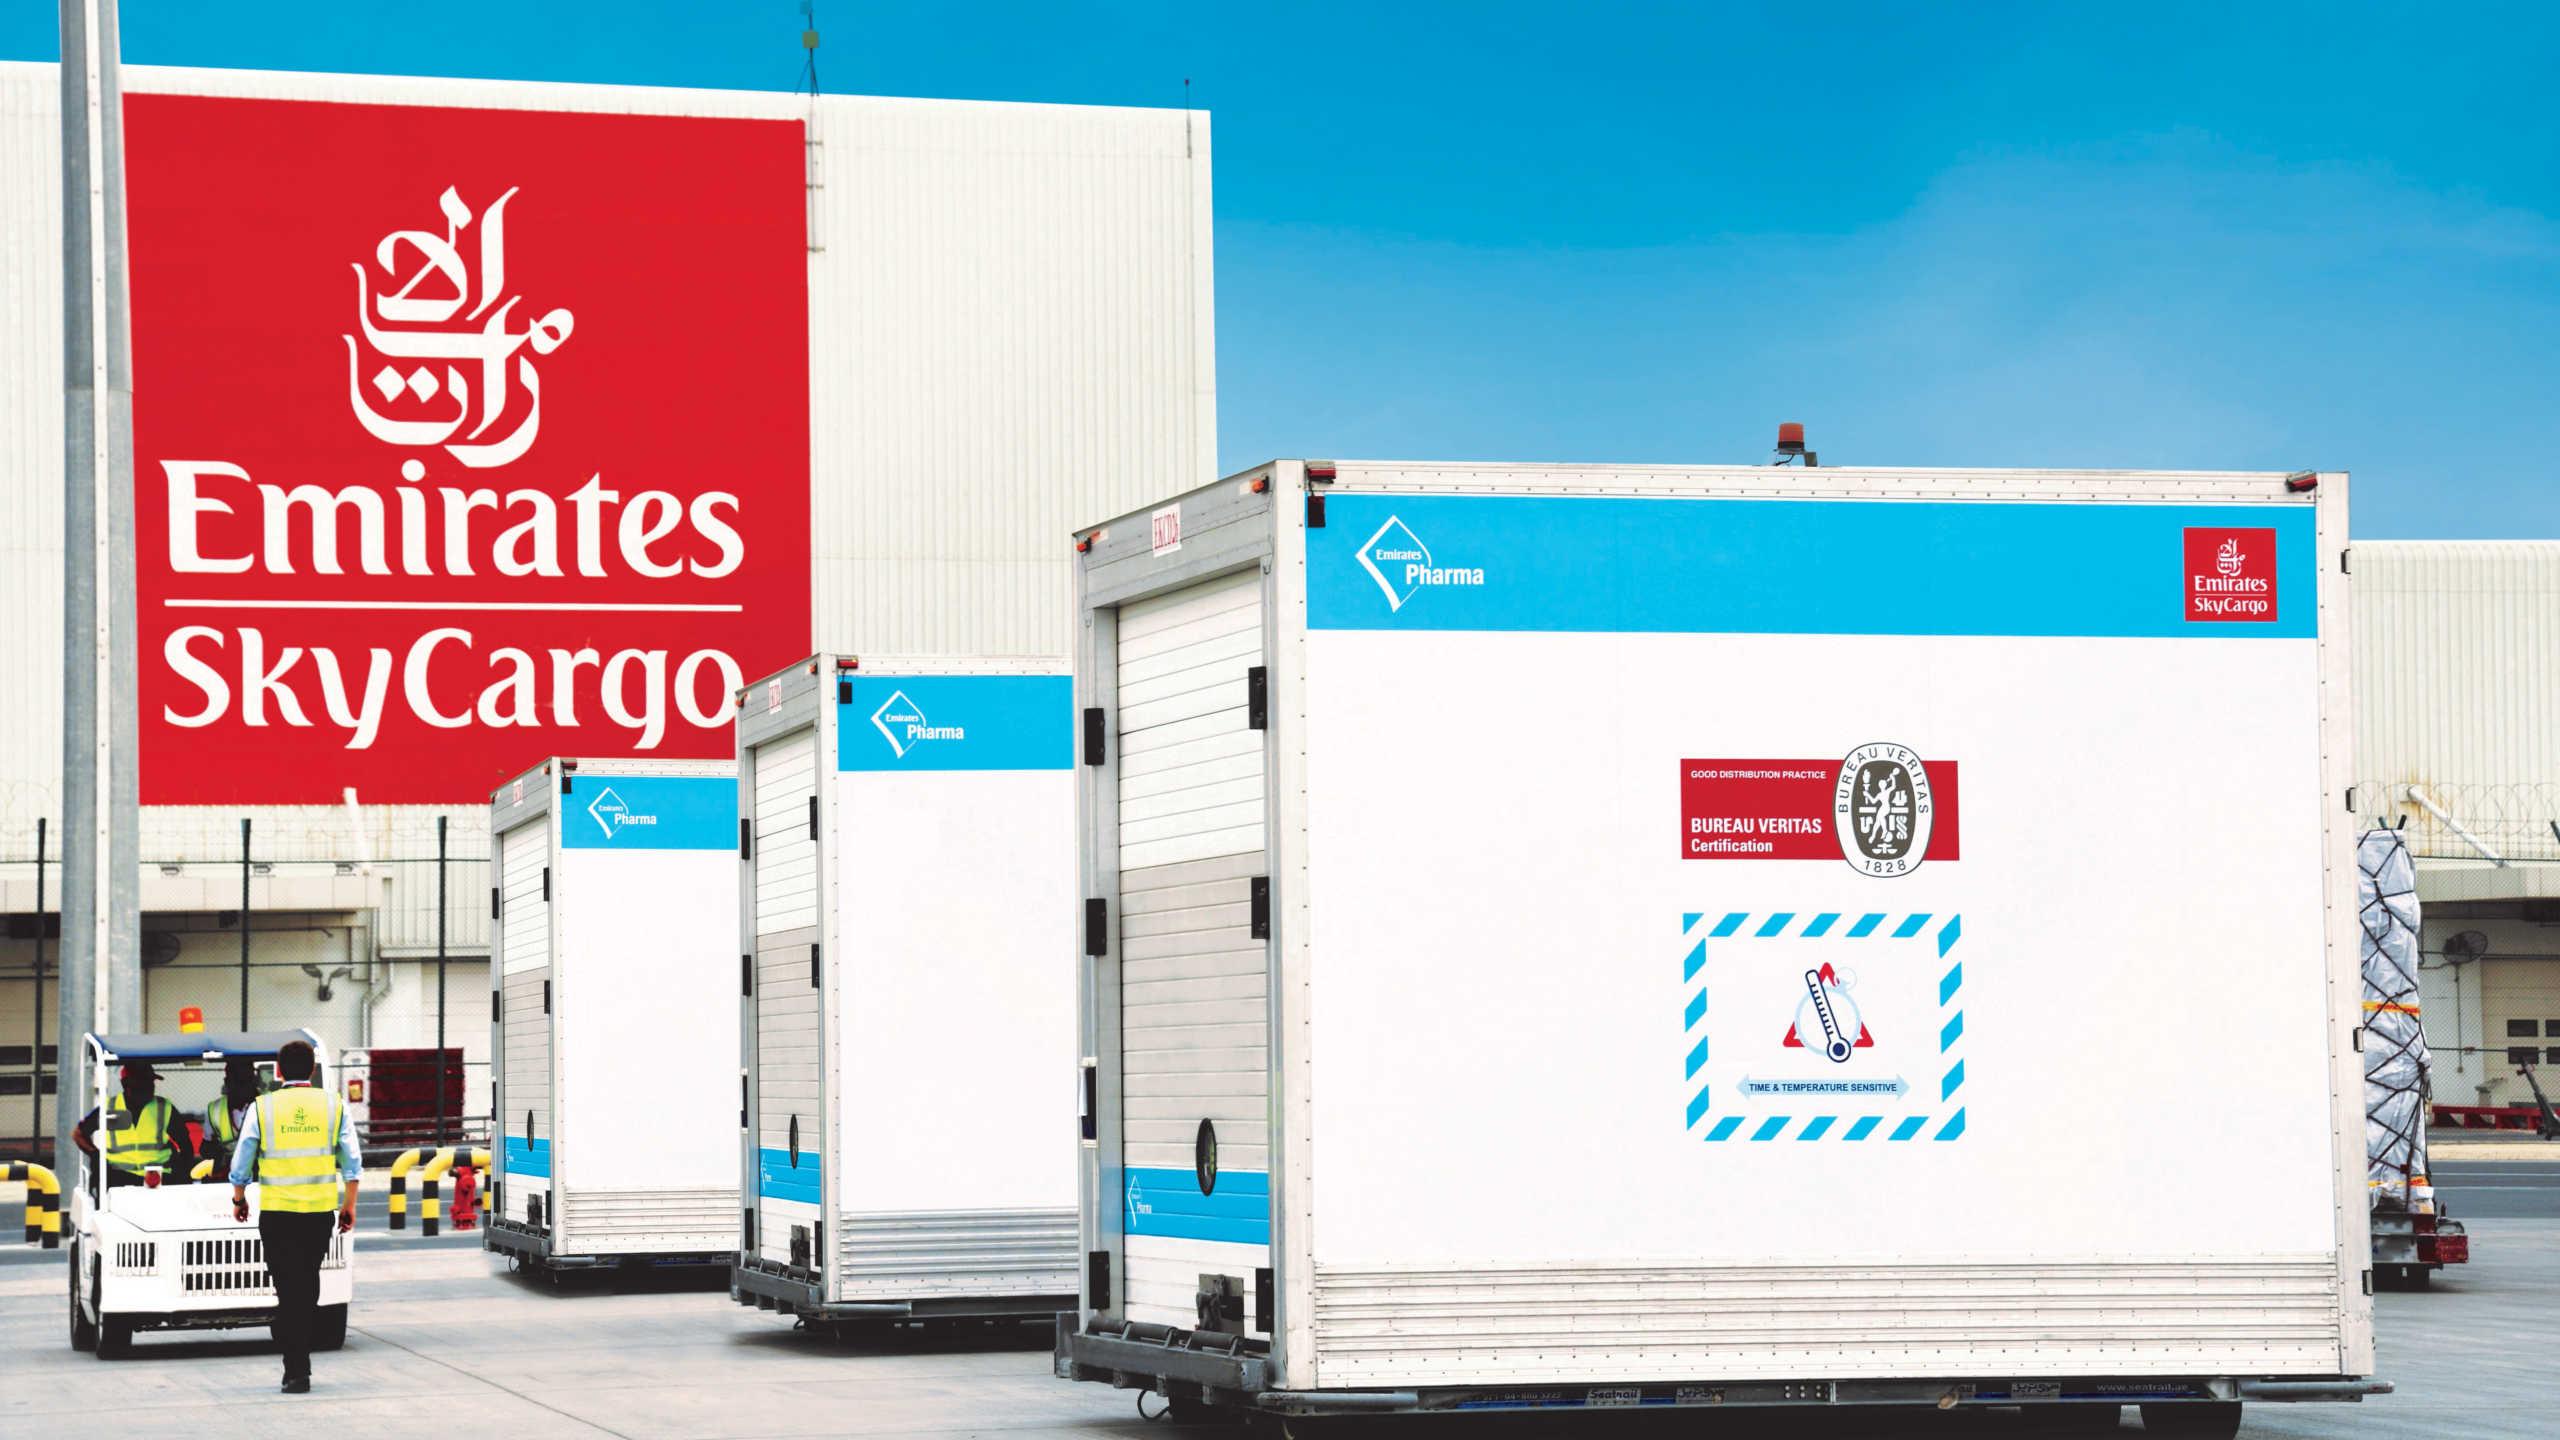 Emirates: Δημιουργεί τον πρώτο αποκλειστικό κόμβο στον κόσμο για το εμβόλιο COVID-19